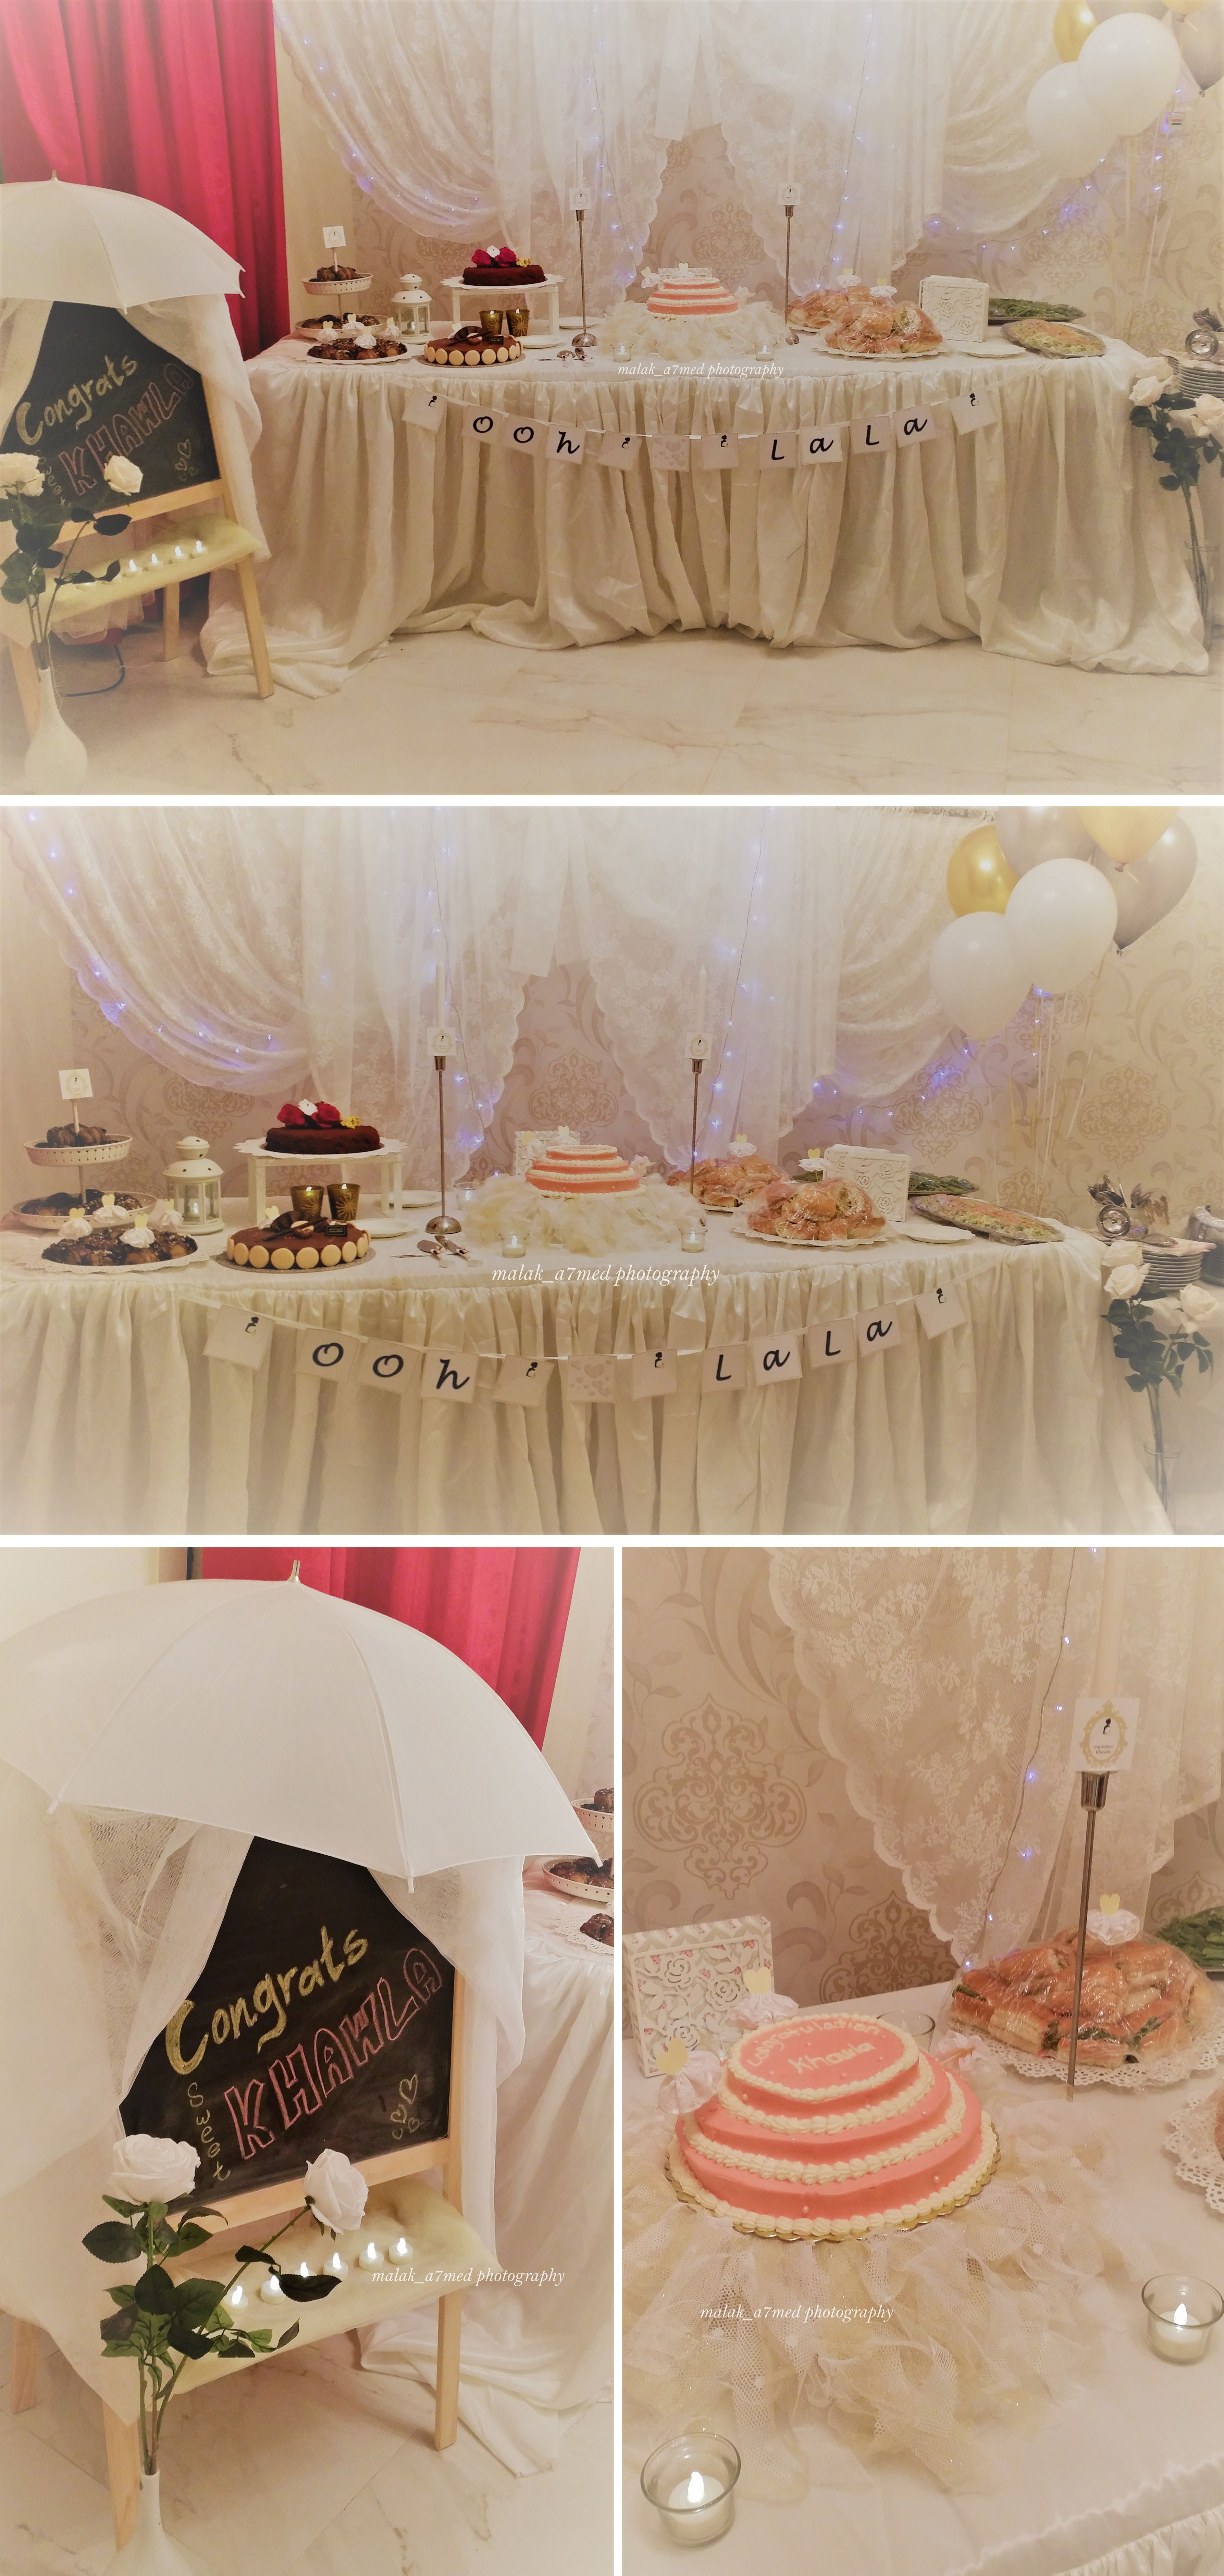 Bridal Pary 2015 حفلة توديع عزوبيه Bridal Pary Powerpoint Slide Designs Party Decorations